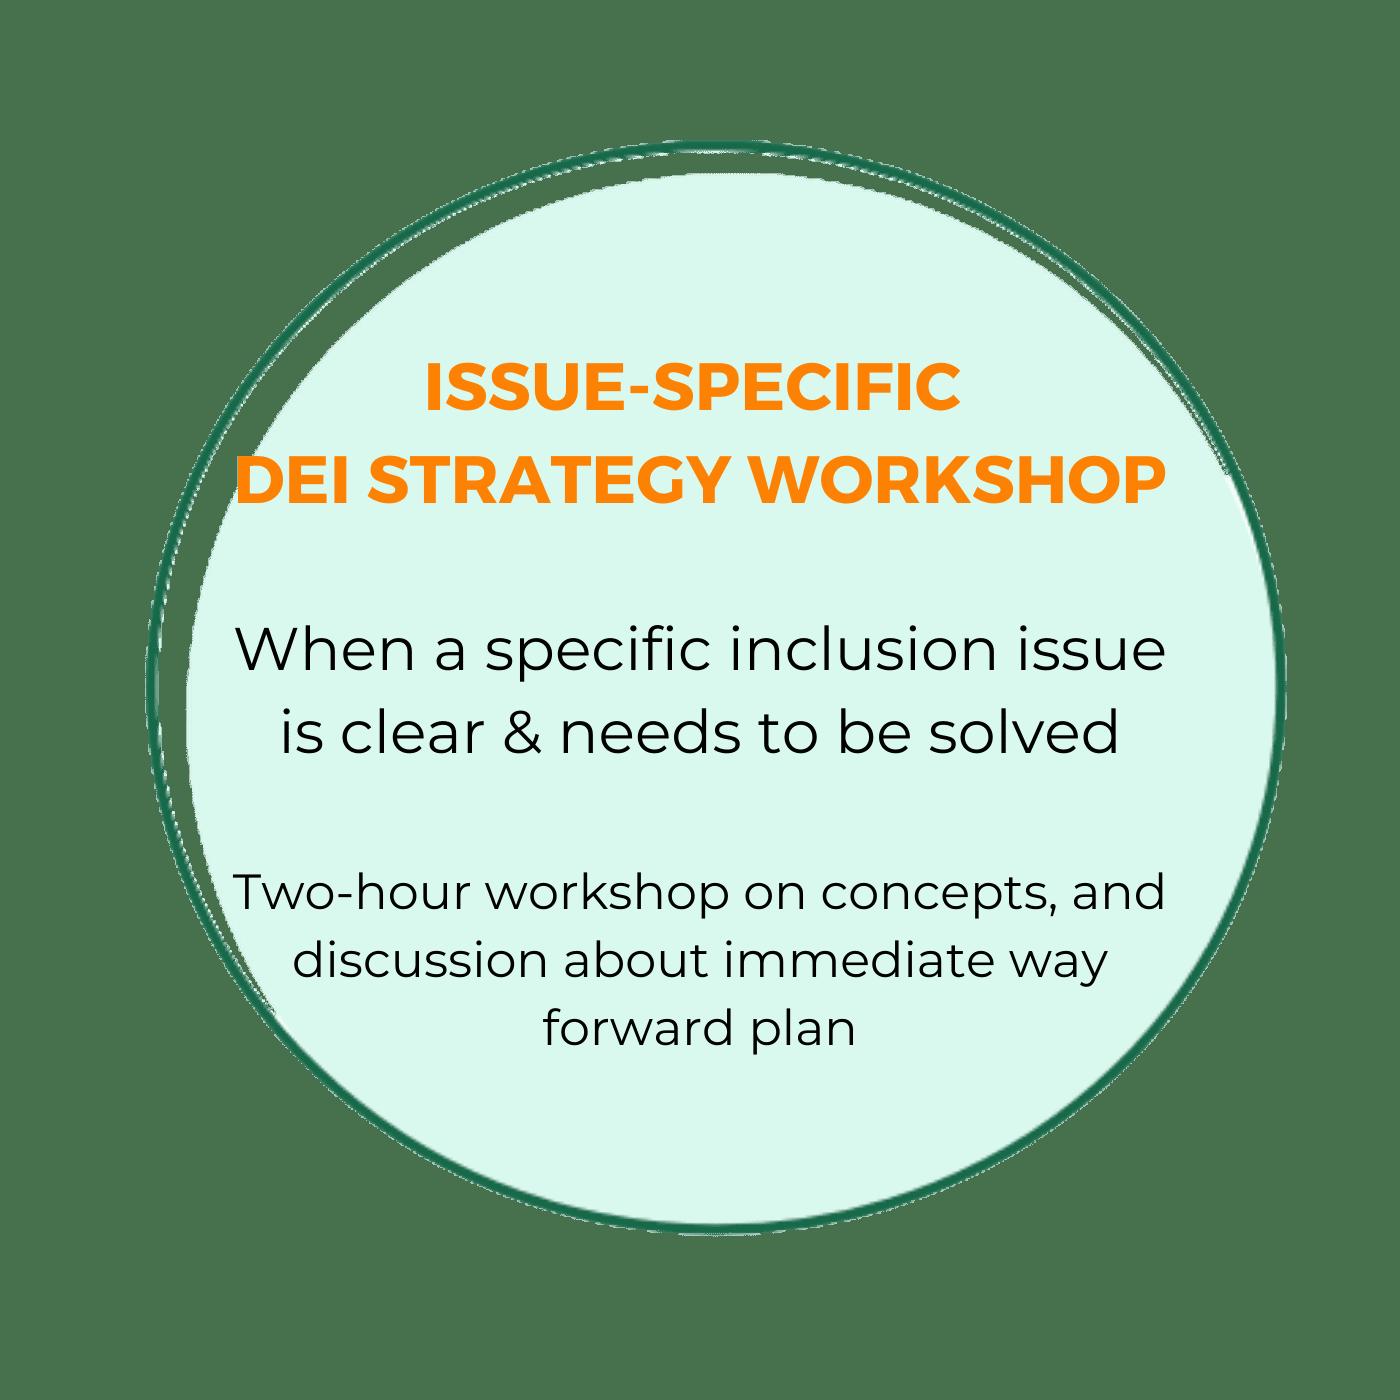 DEI strategy workshop